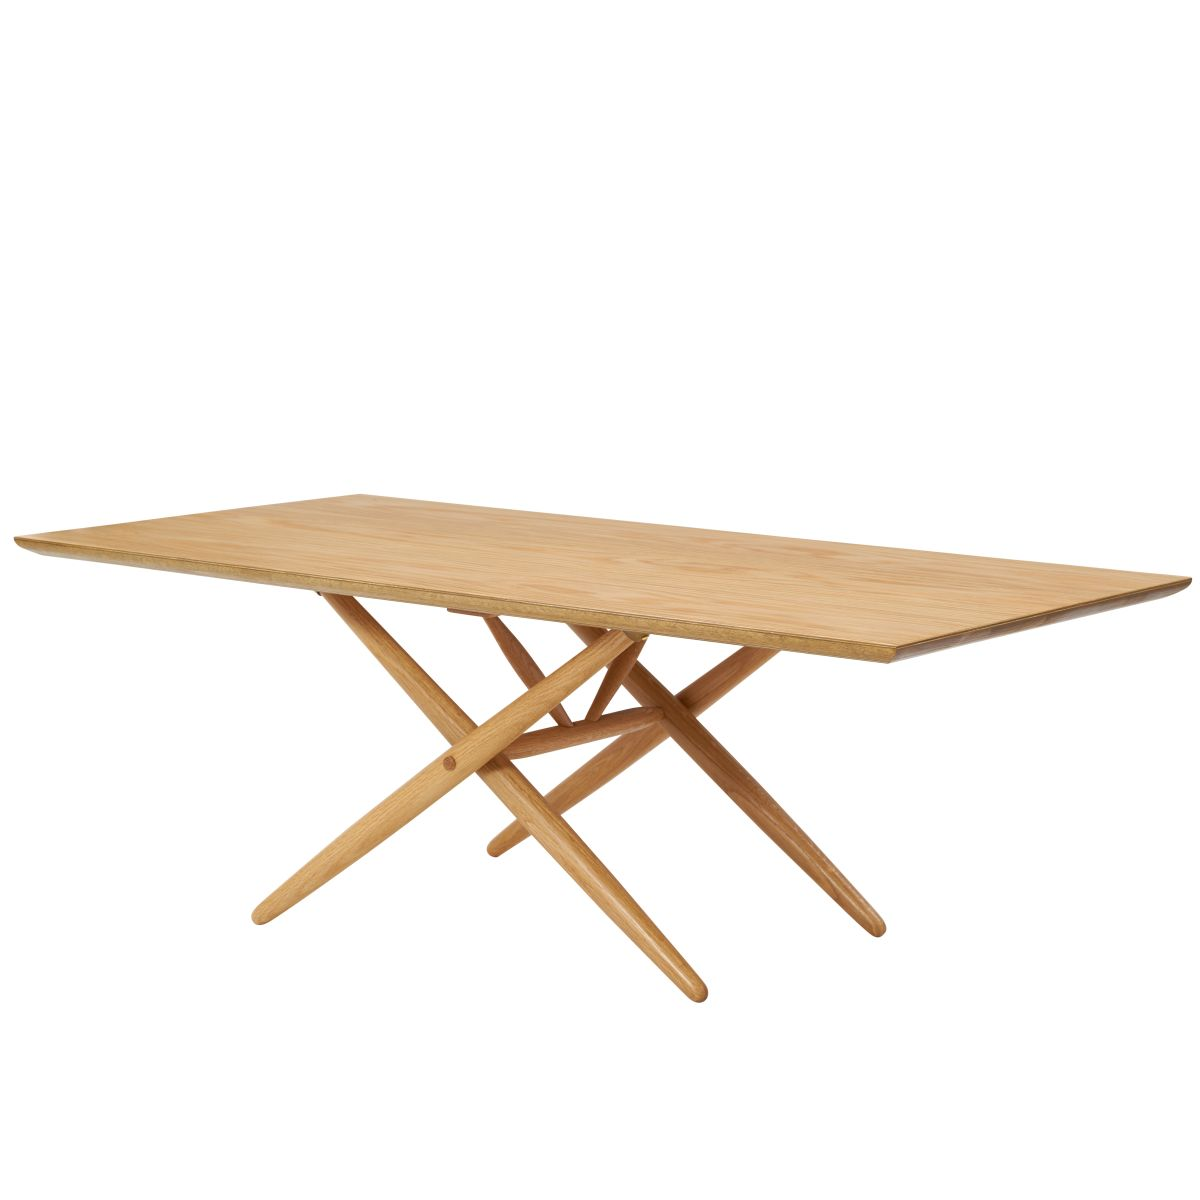 Domino-Coffee-Table-oak-2627421